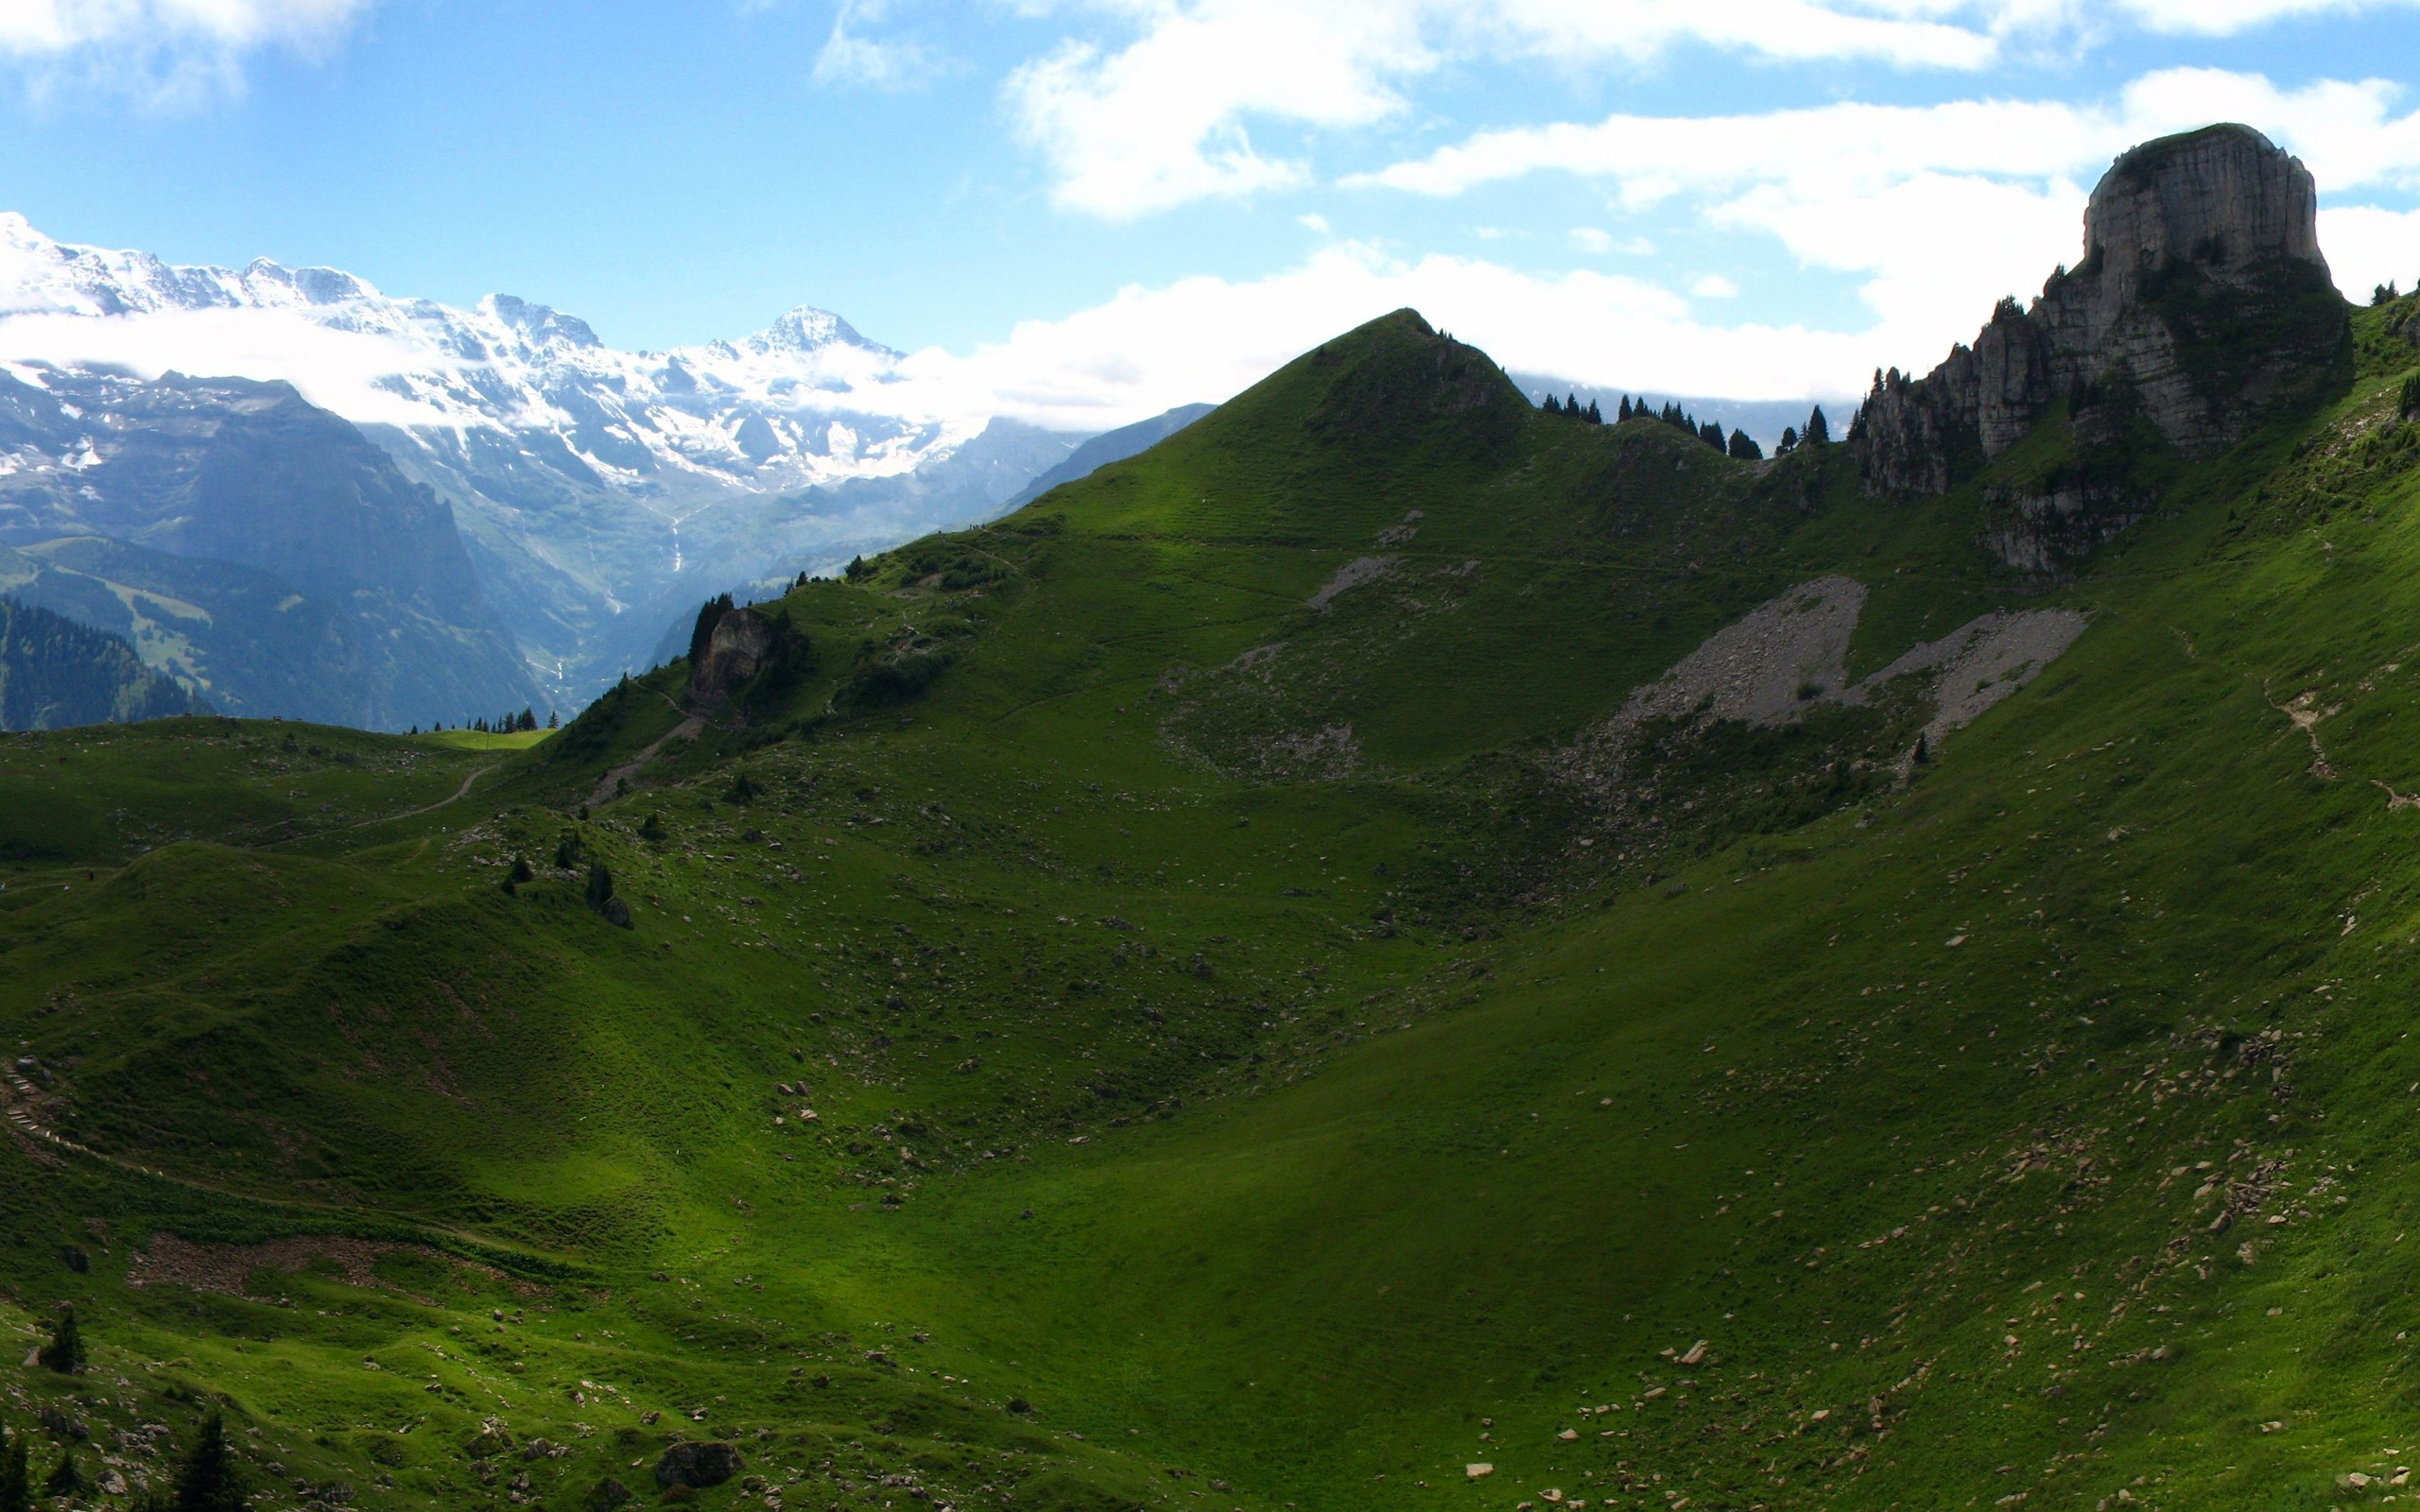 mountain and the greenary - photo #16